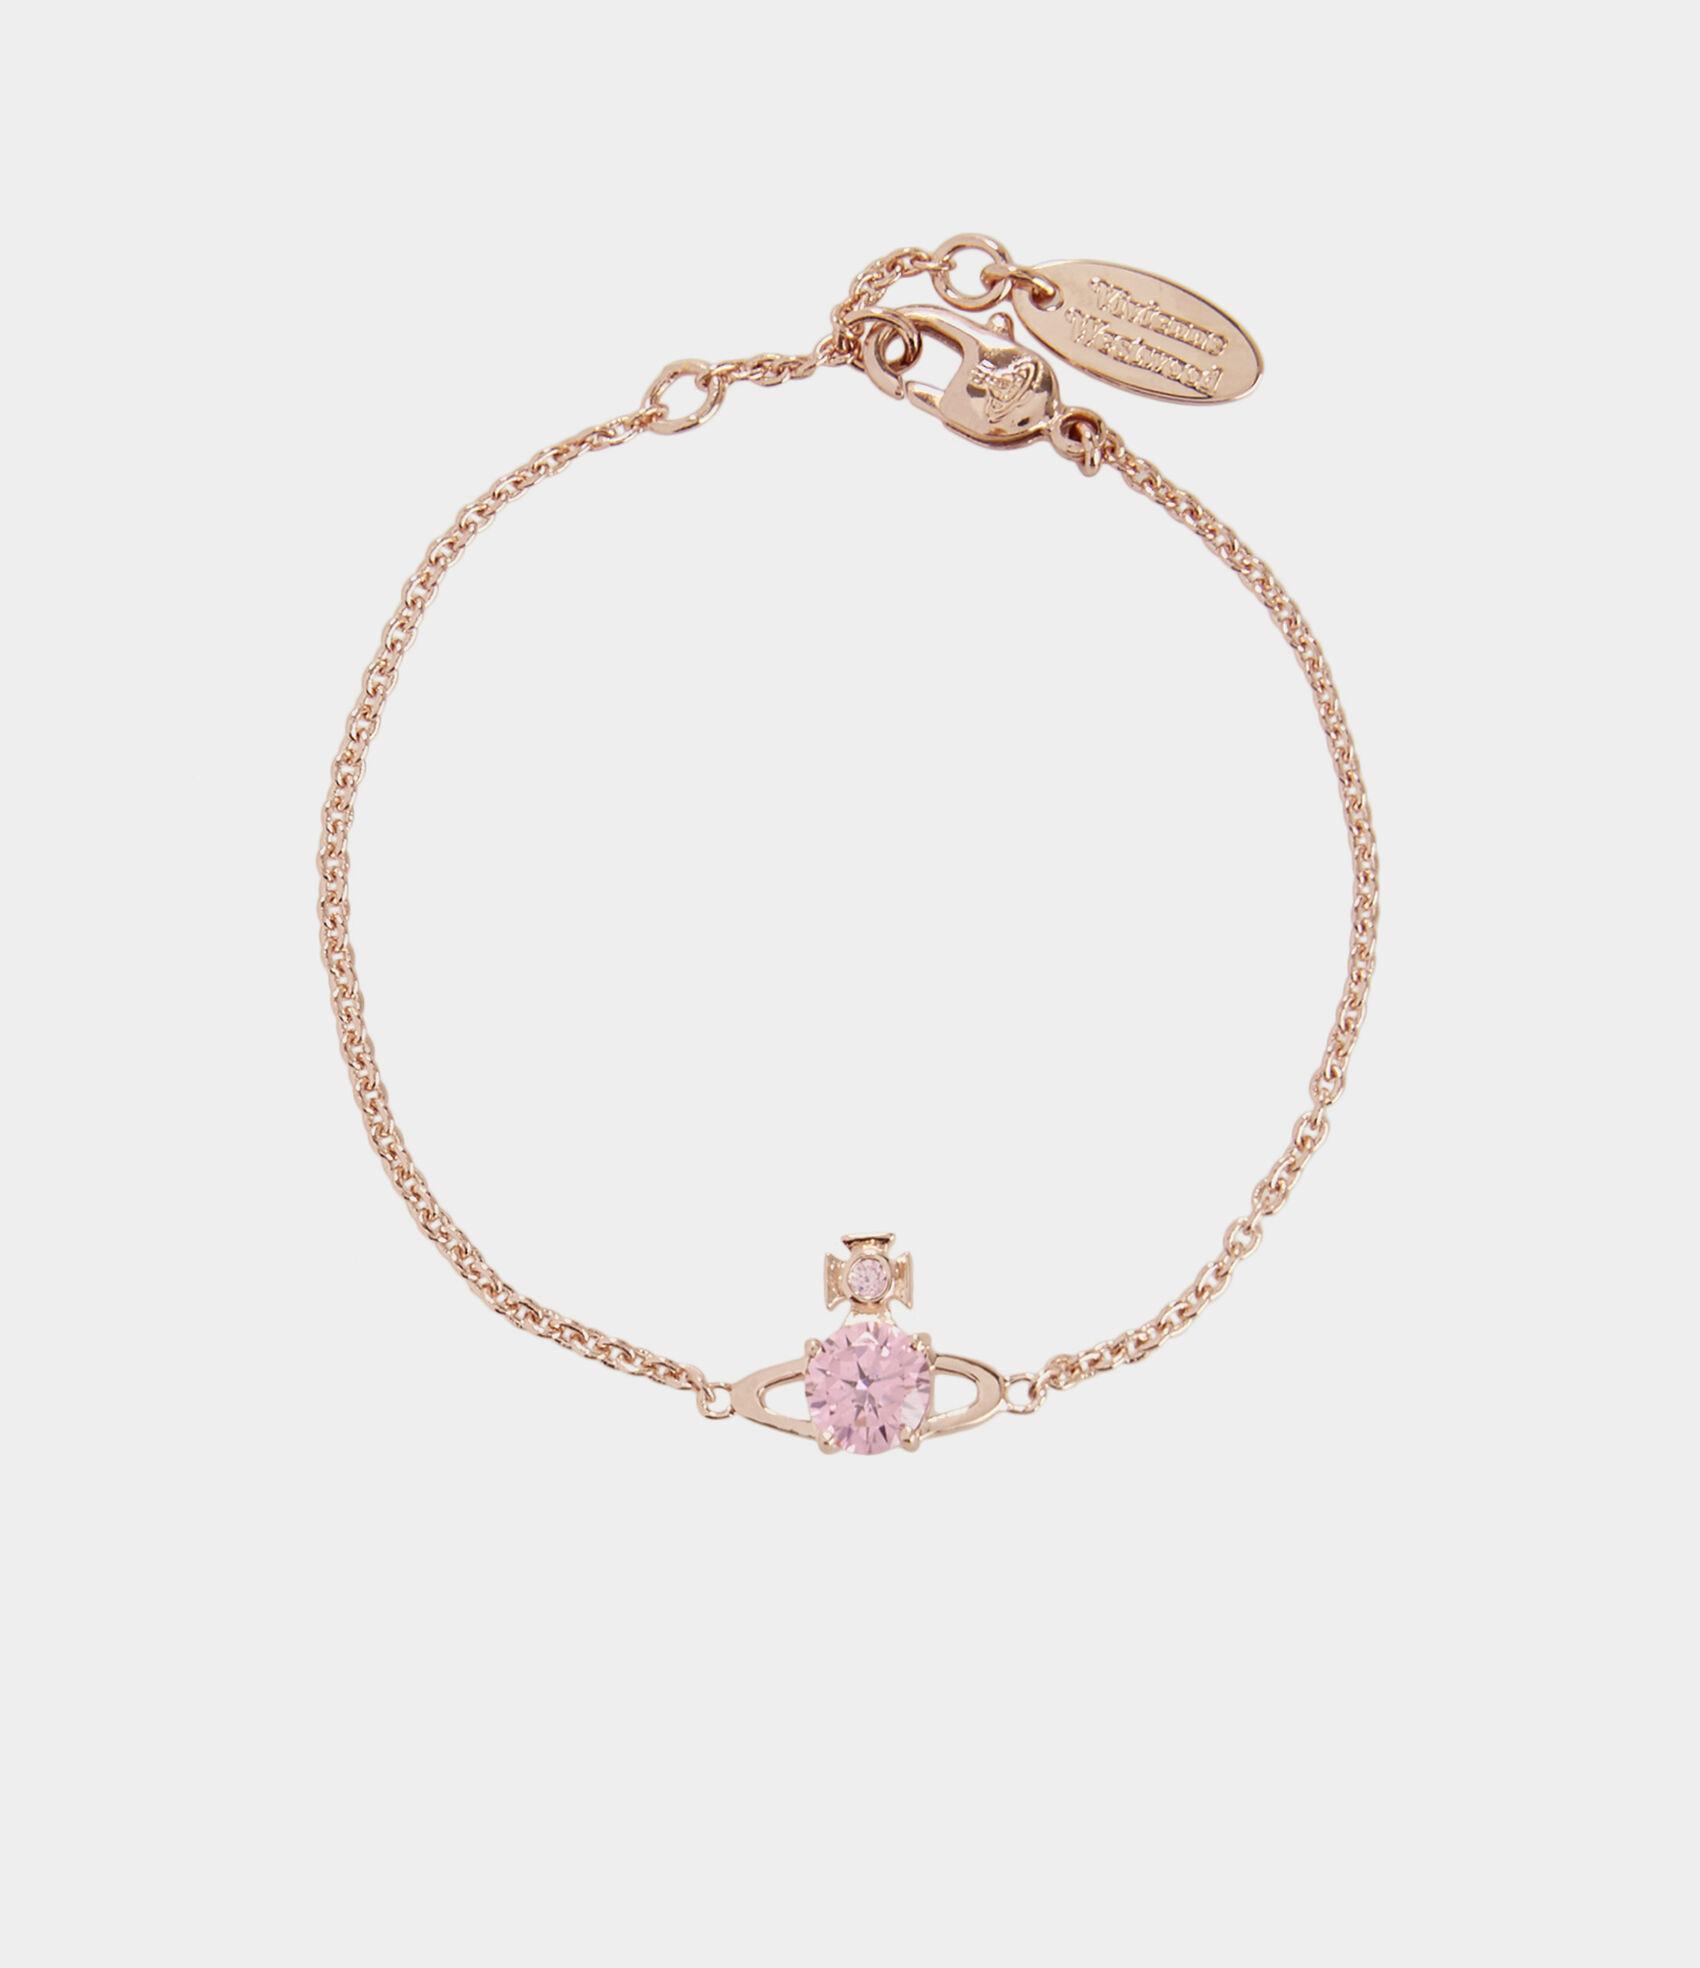 Vivienne Westwood Women S Designer Bracelets Reina Small Bracelet